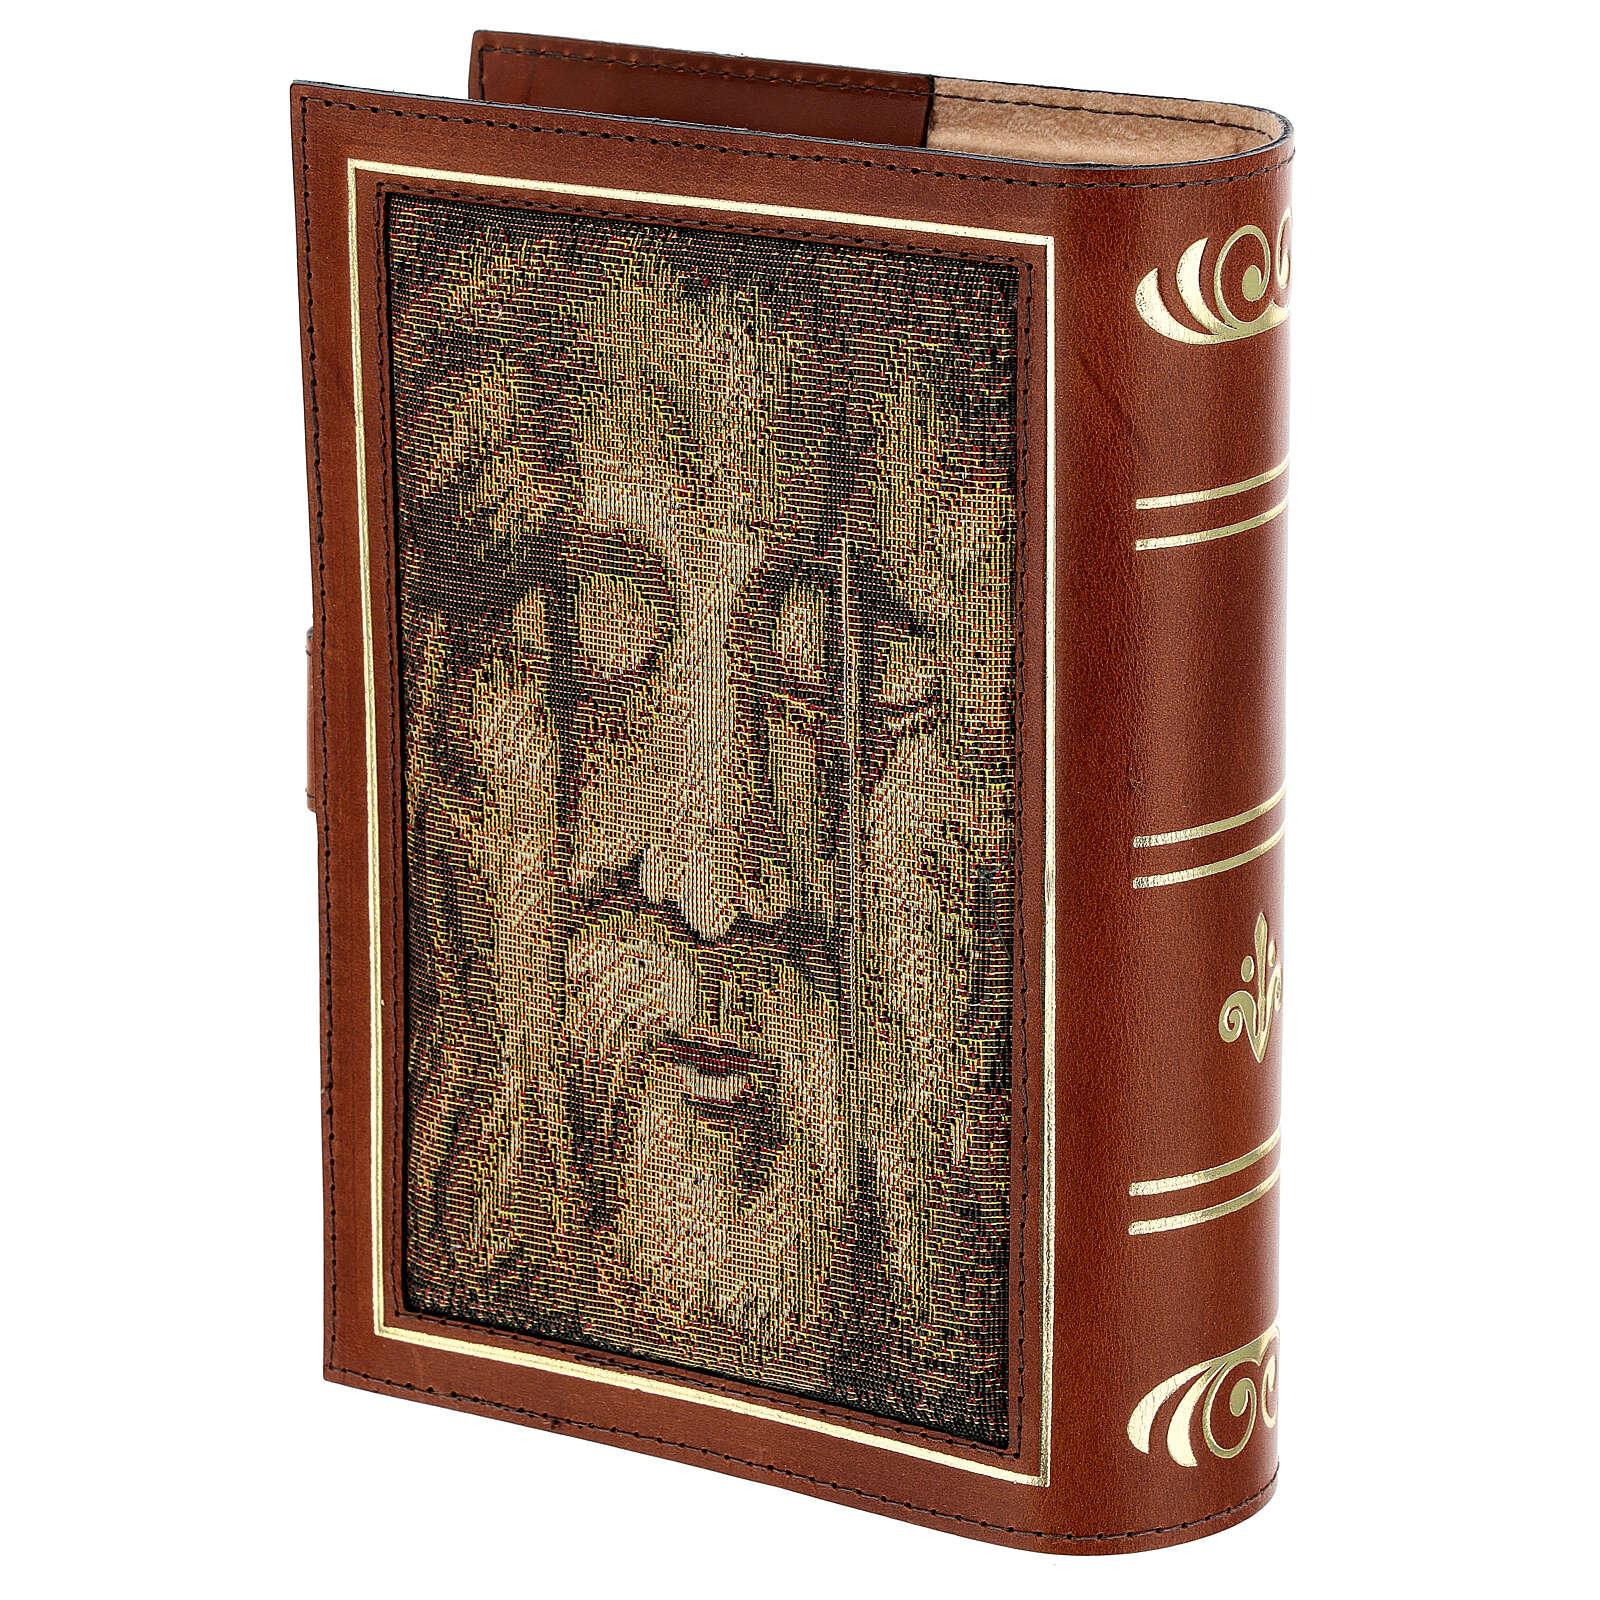 Custodia Neocatecumenale vera pelle Bibbia Gerusalemme 4